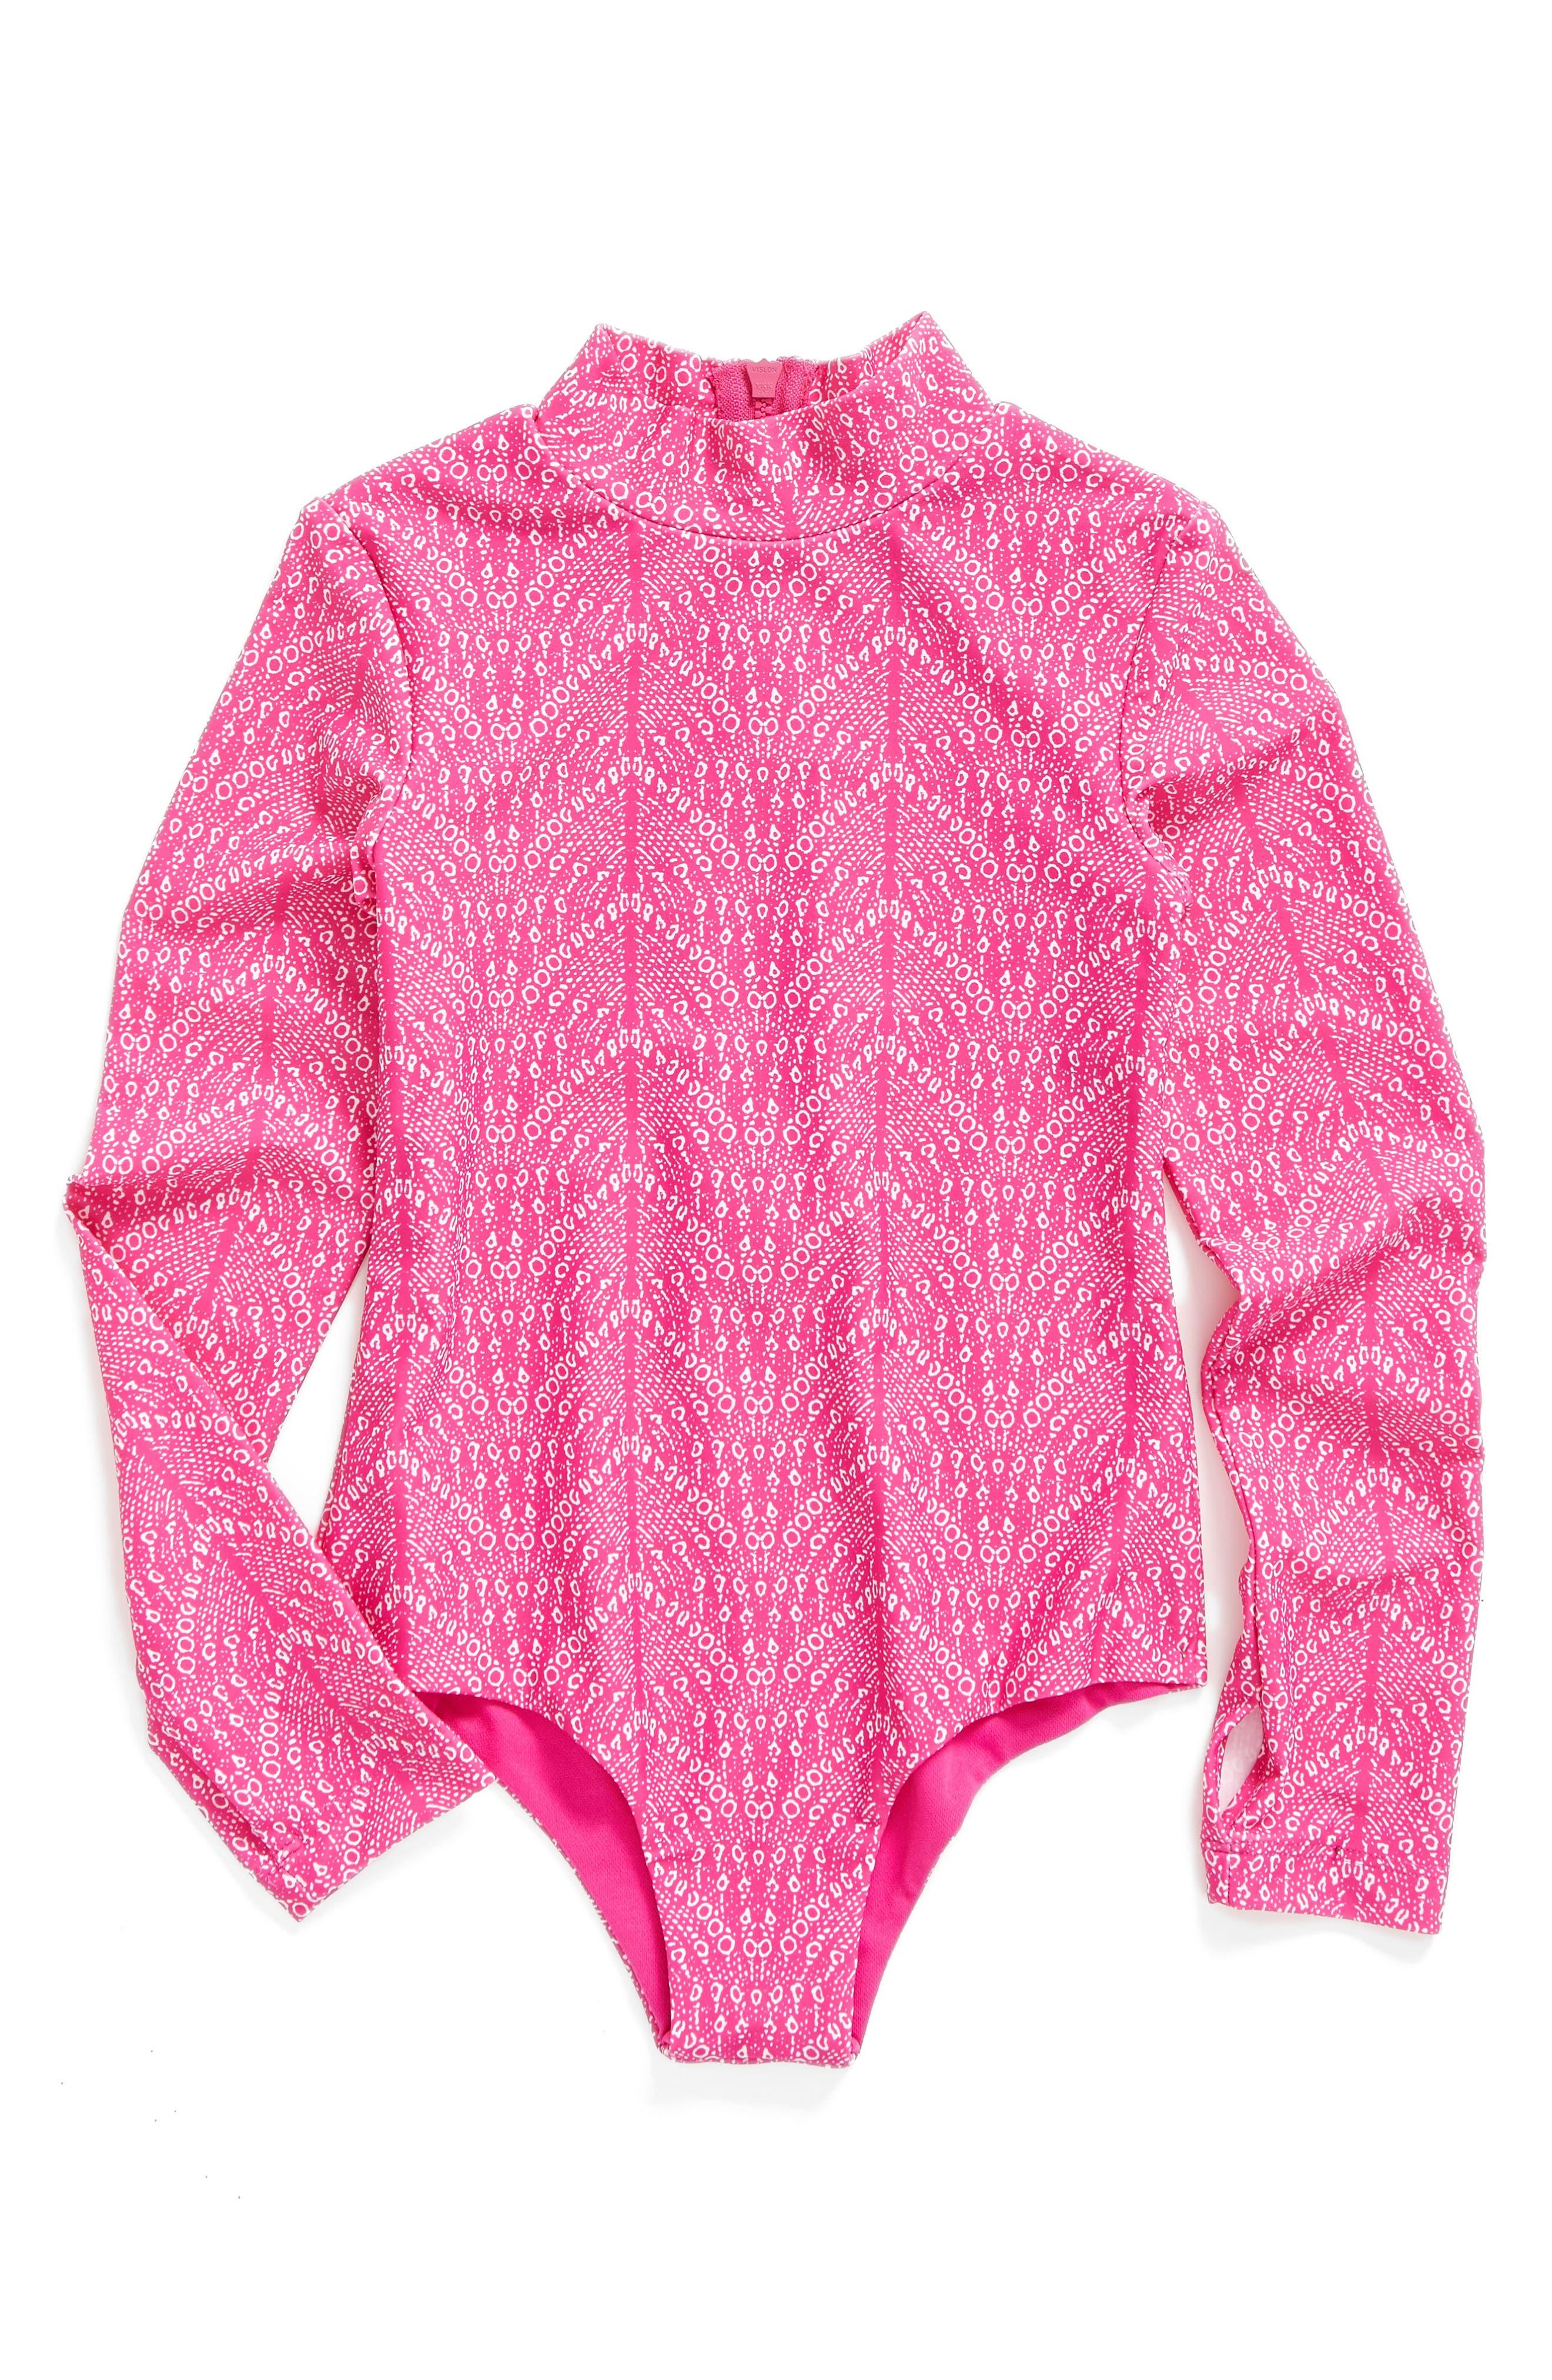 MOTT 50 UPF 50+ One-Piece Swimsuit